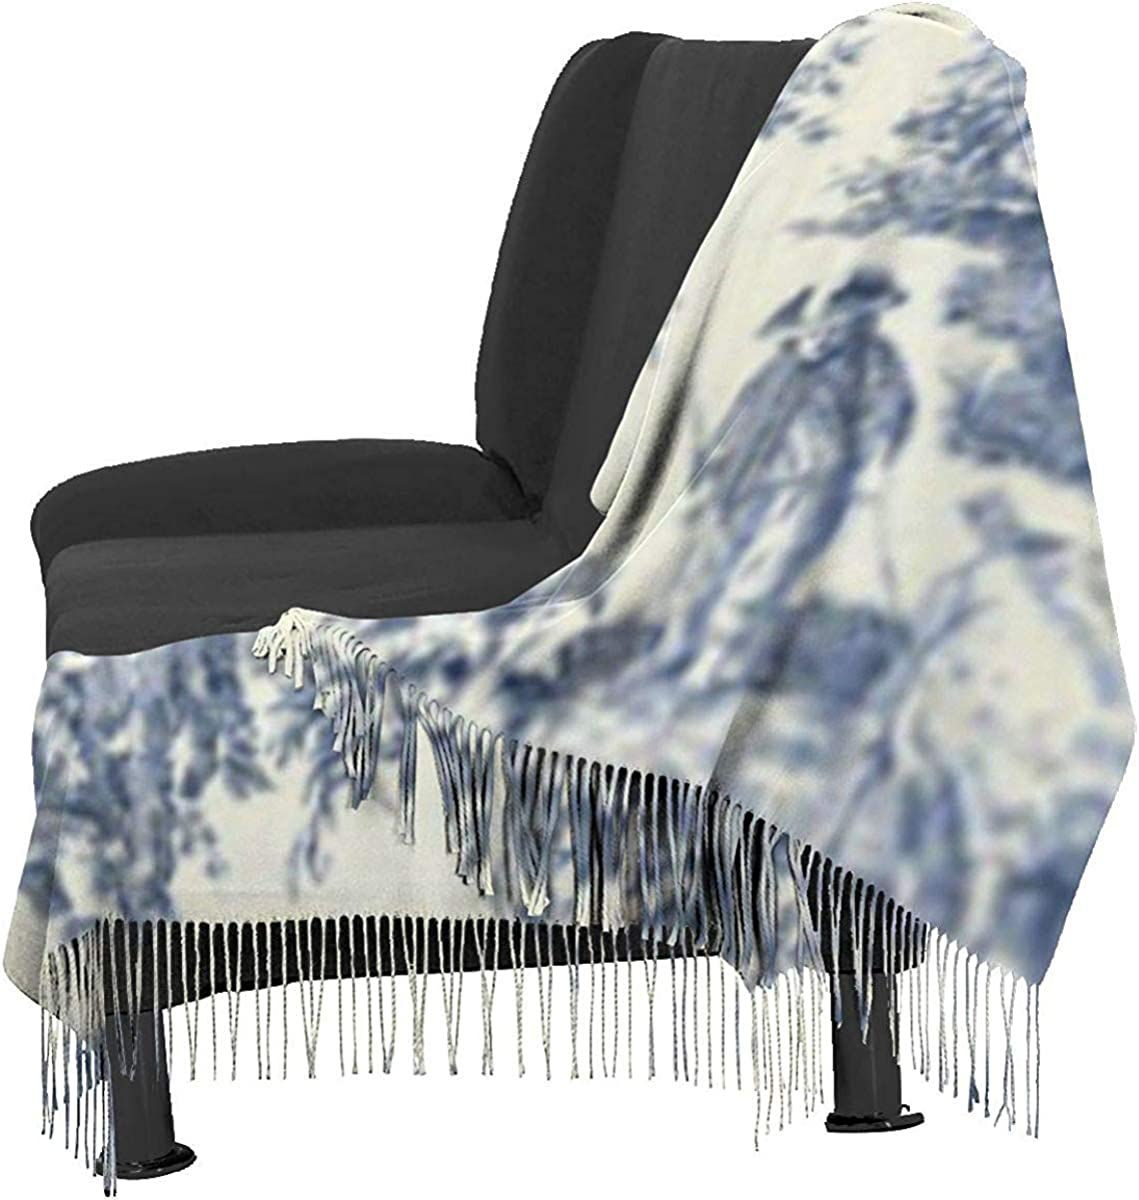 Scarf Toile De Jouy Wallpaper Cozy Soft Fashion Winter Warm Large Scarf Long Shawl JJsister Foulards,Echarpes,Pashmina Femme Ch/âle Wrap